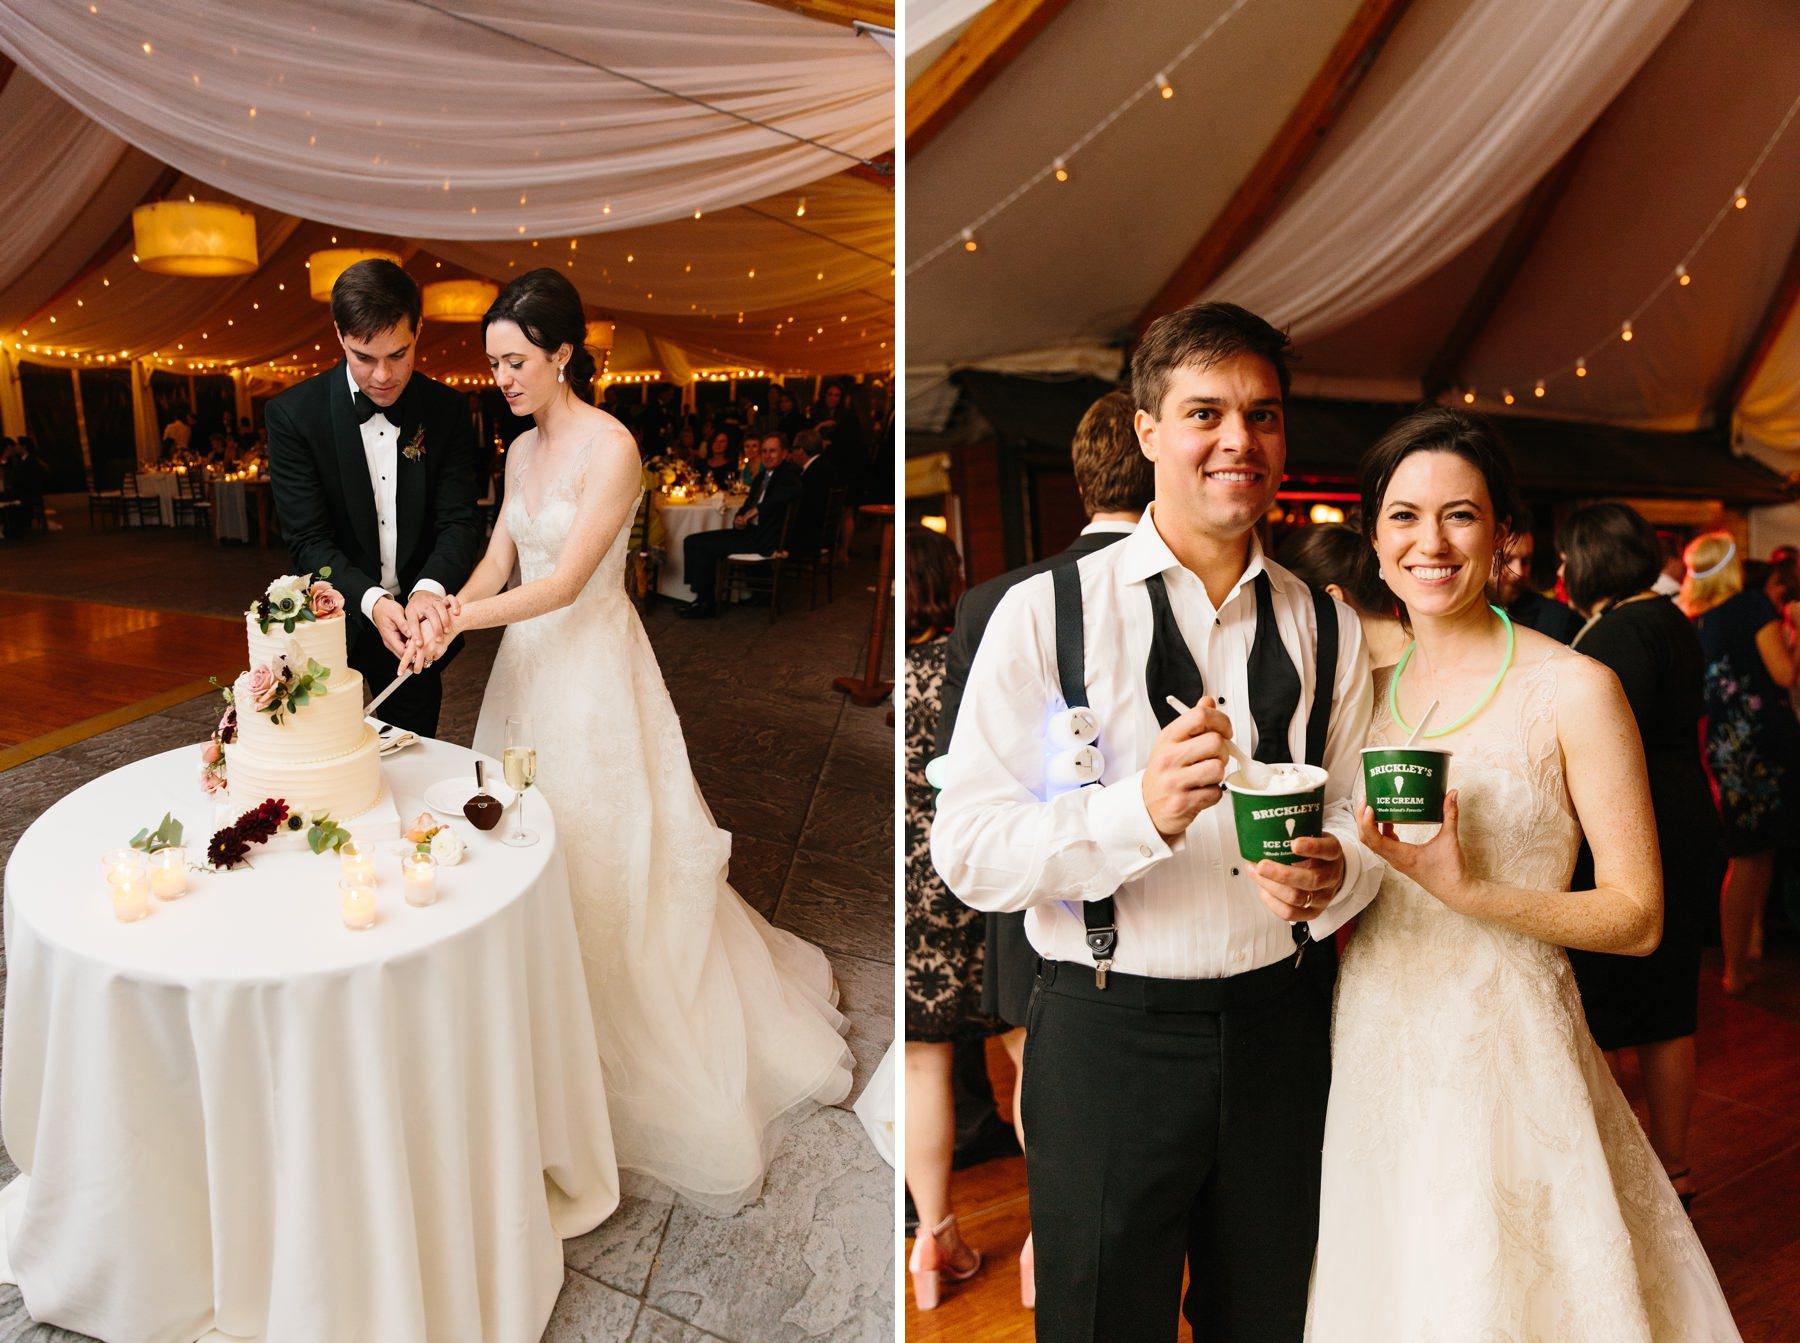 brickleys ice cream wedding